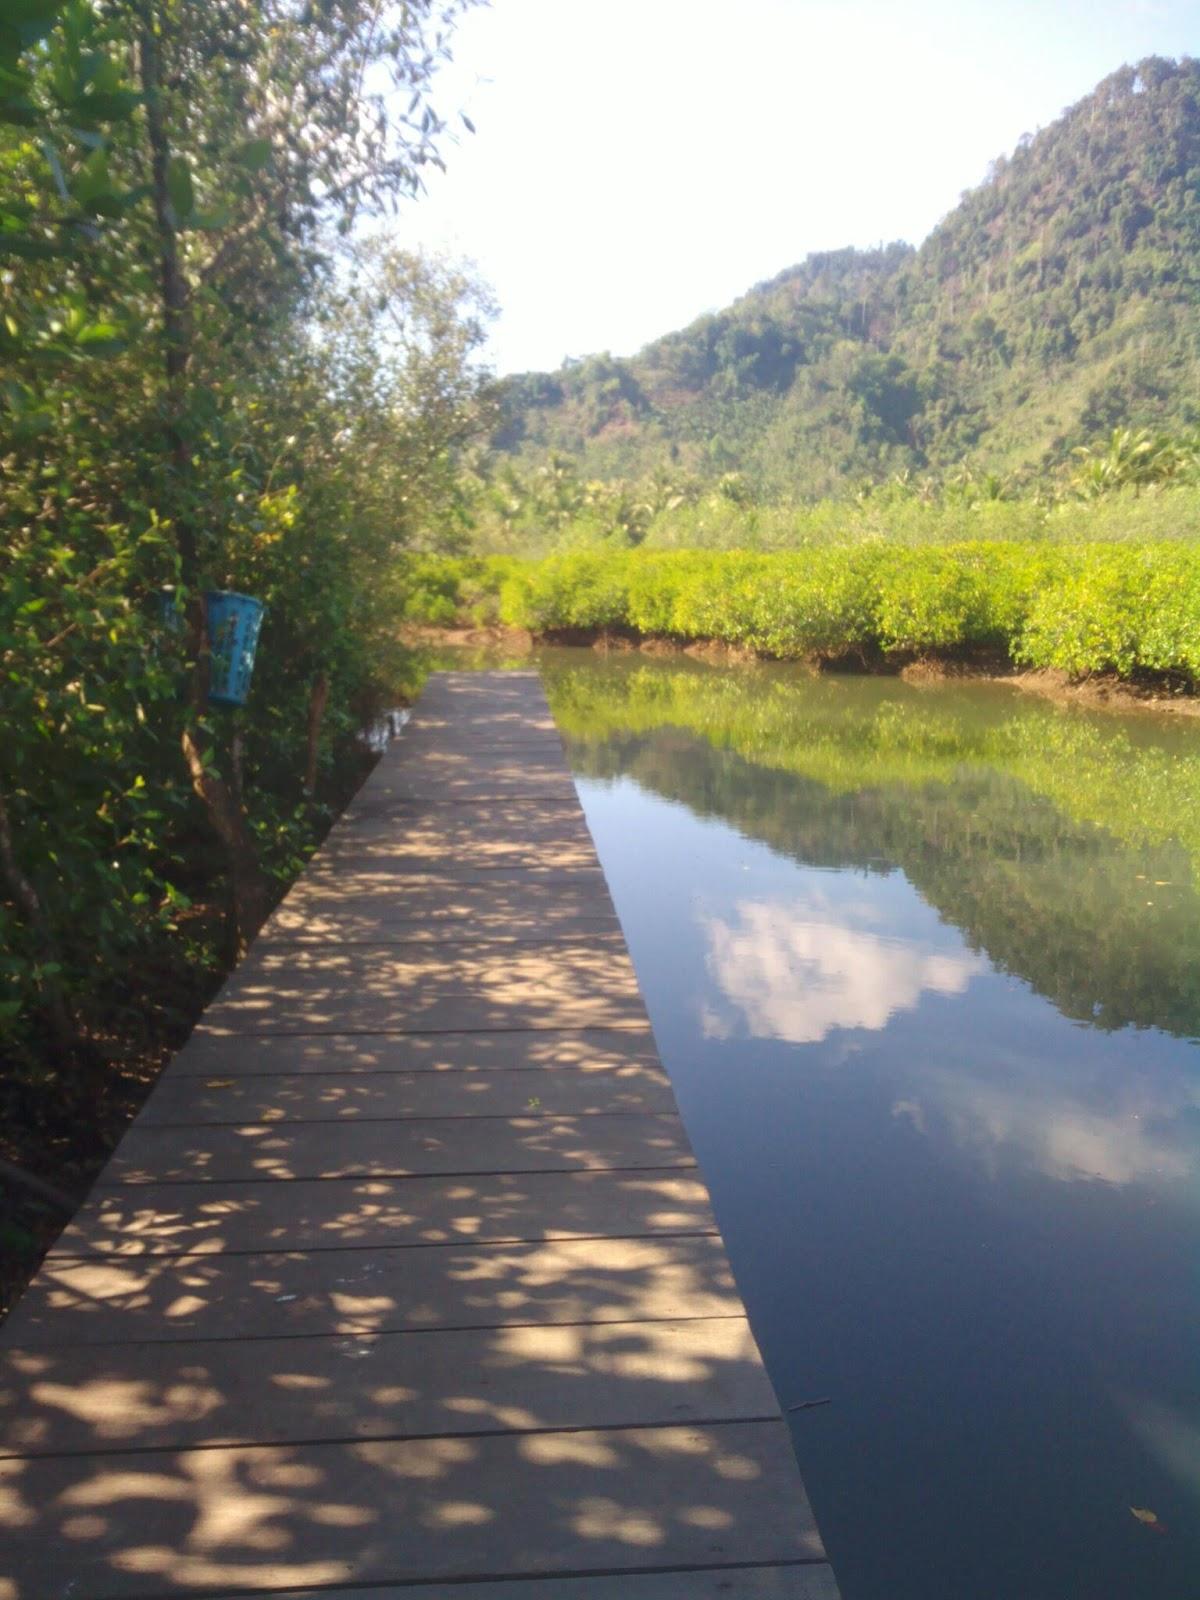 Hutan Mangrove Pancer Cengkrong 2015 Melakukan Prewedding Rata Luar Kota